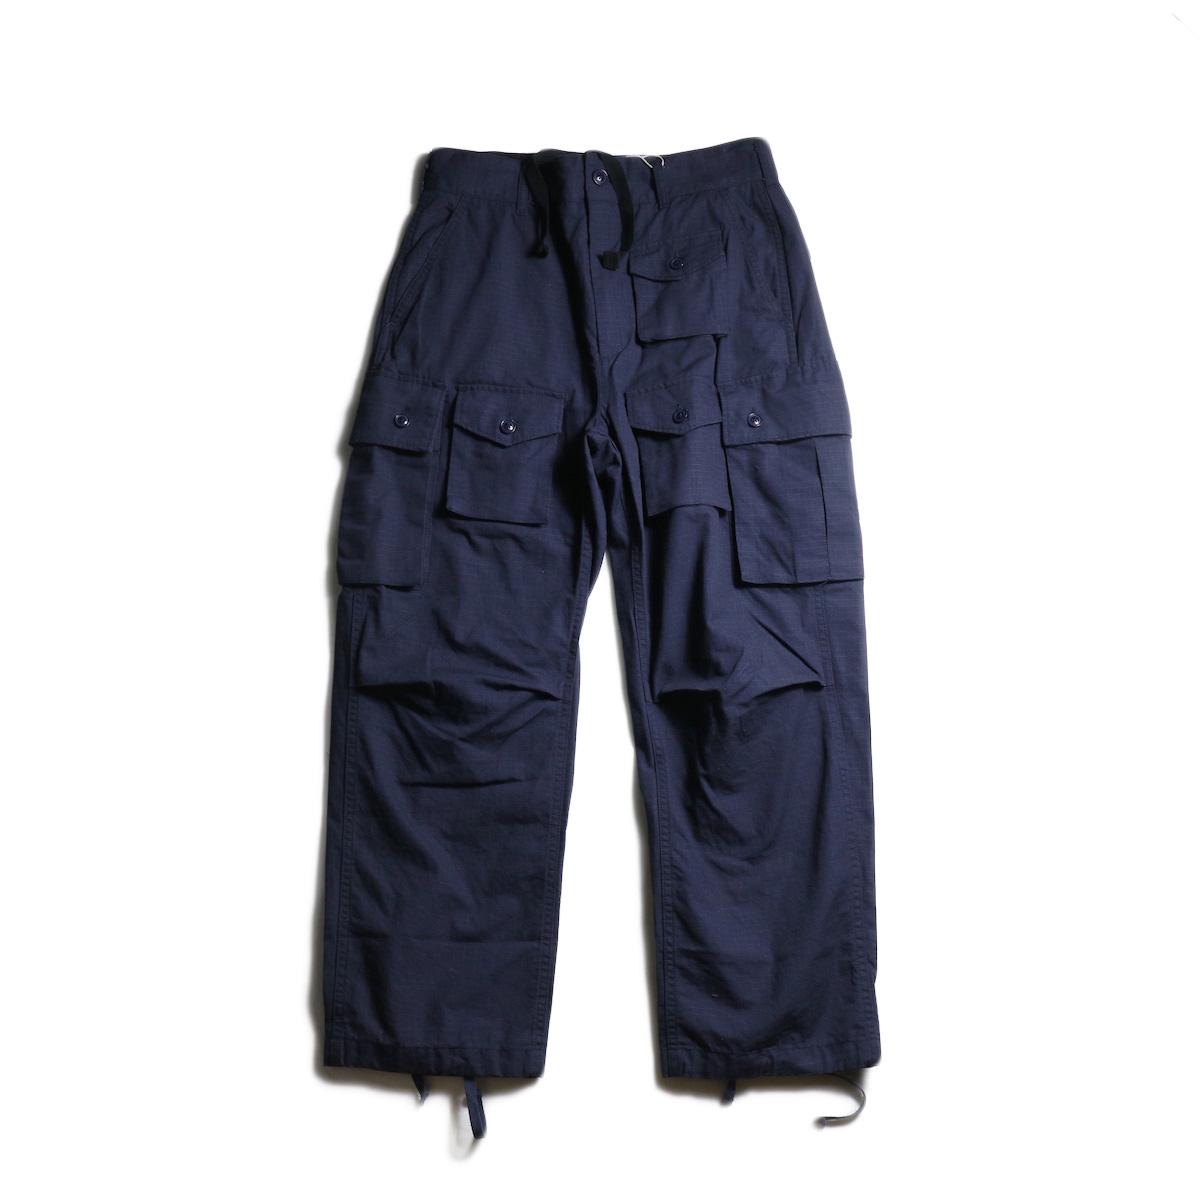 ENGINEERED GARMENTS /  FA Pant -Cotton Ripstop (Navy)